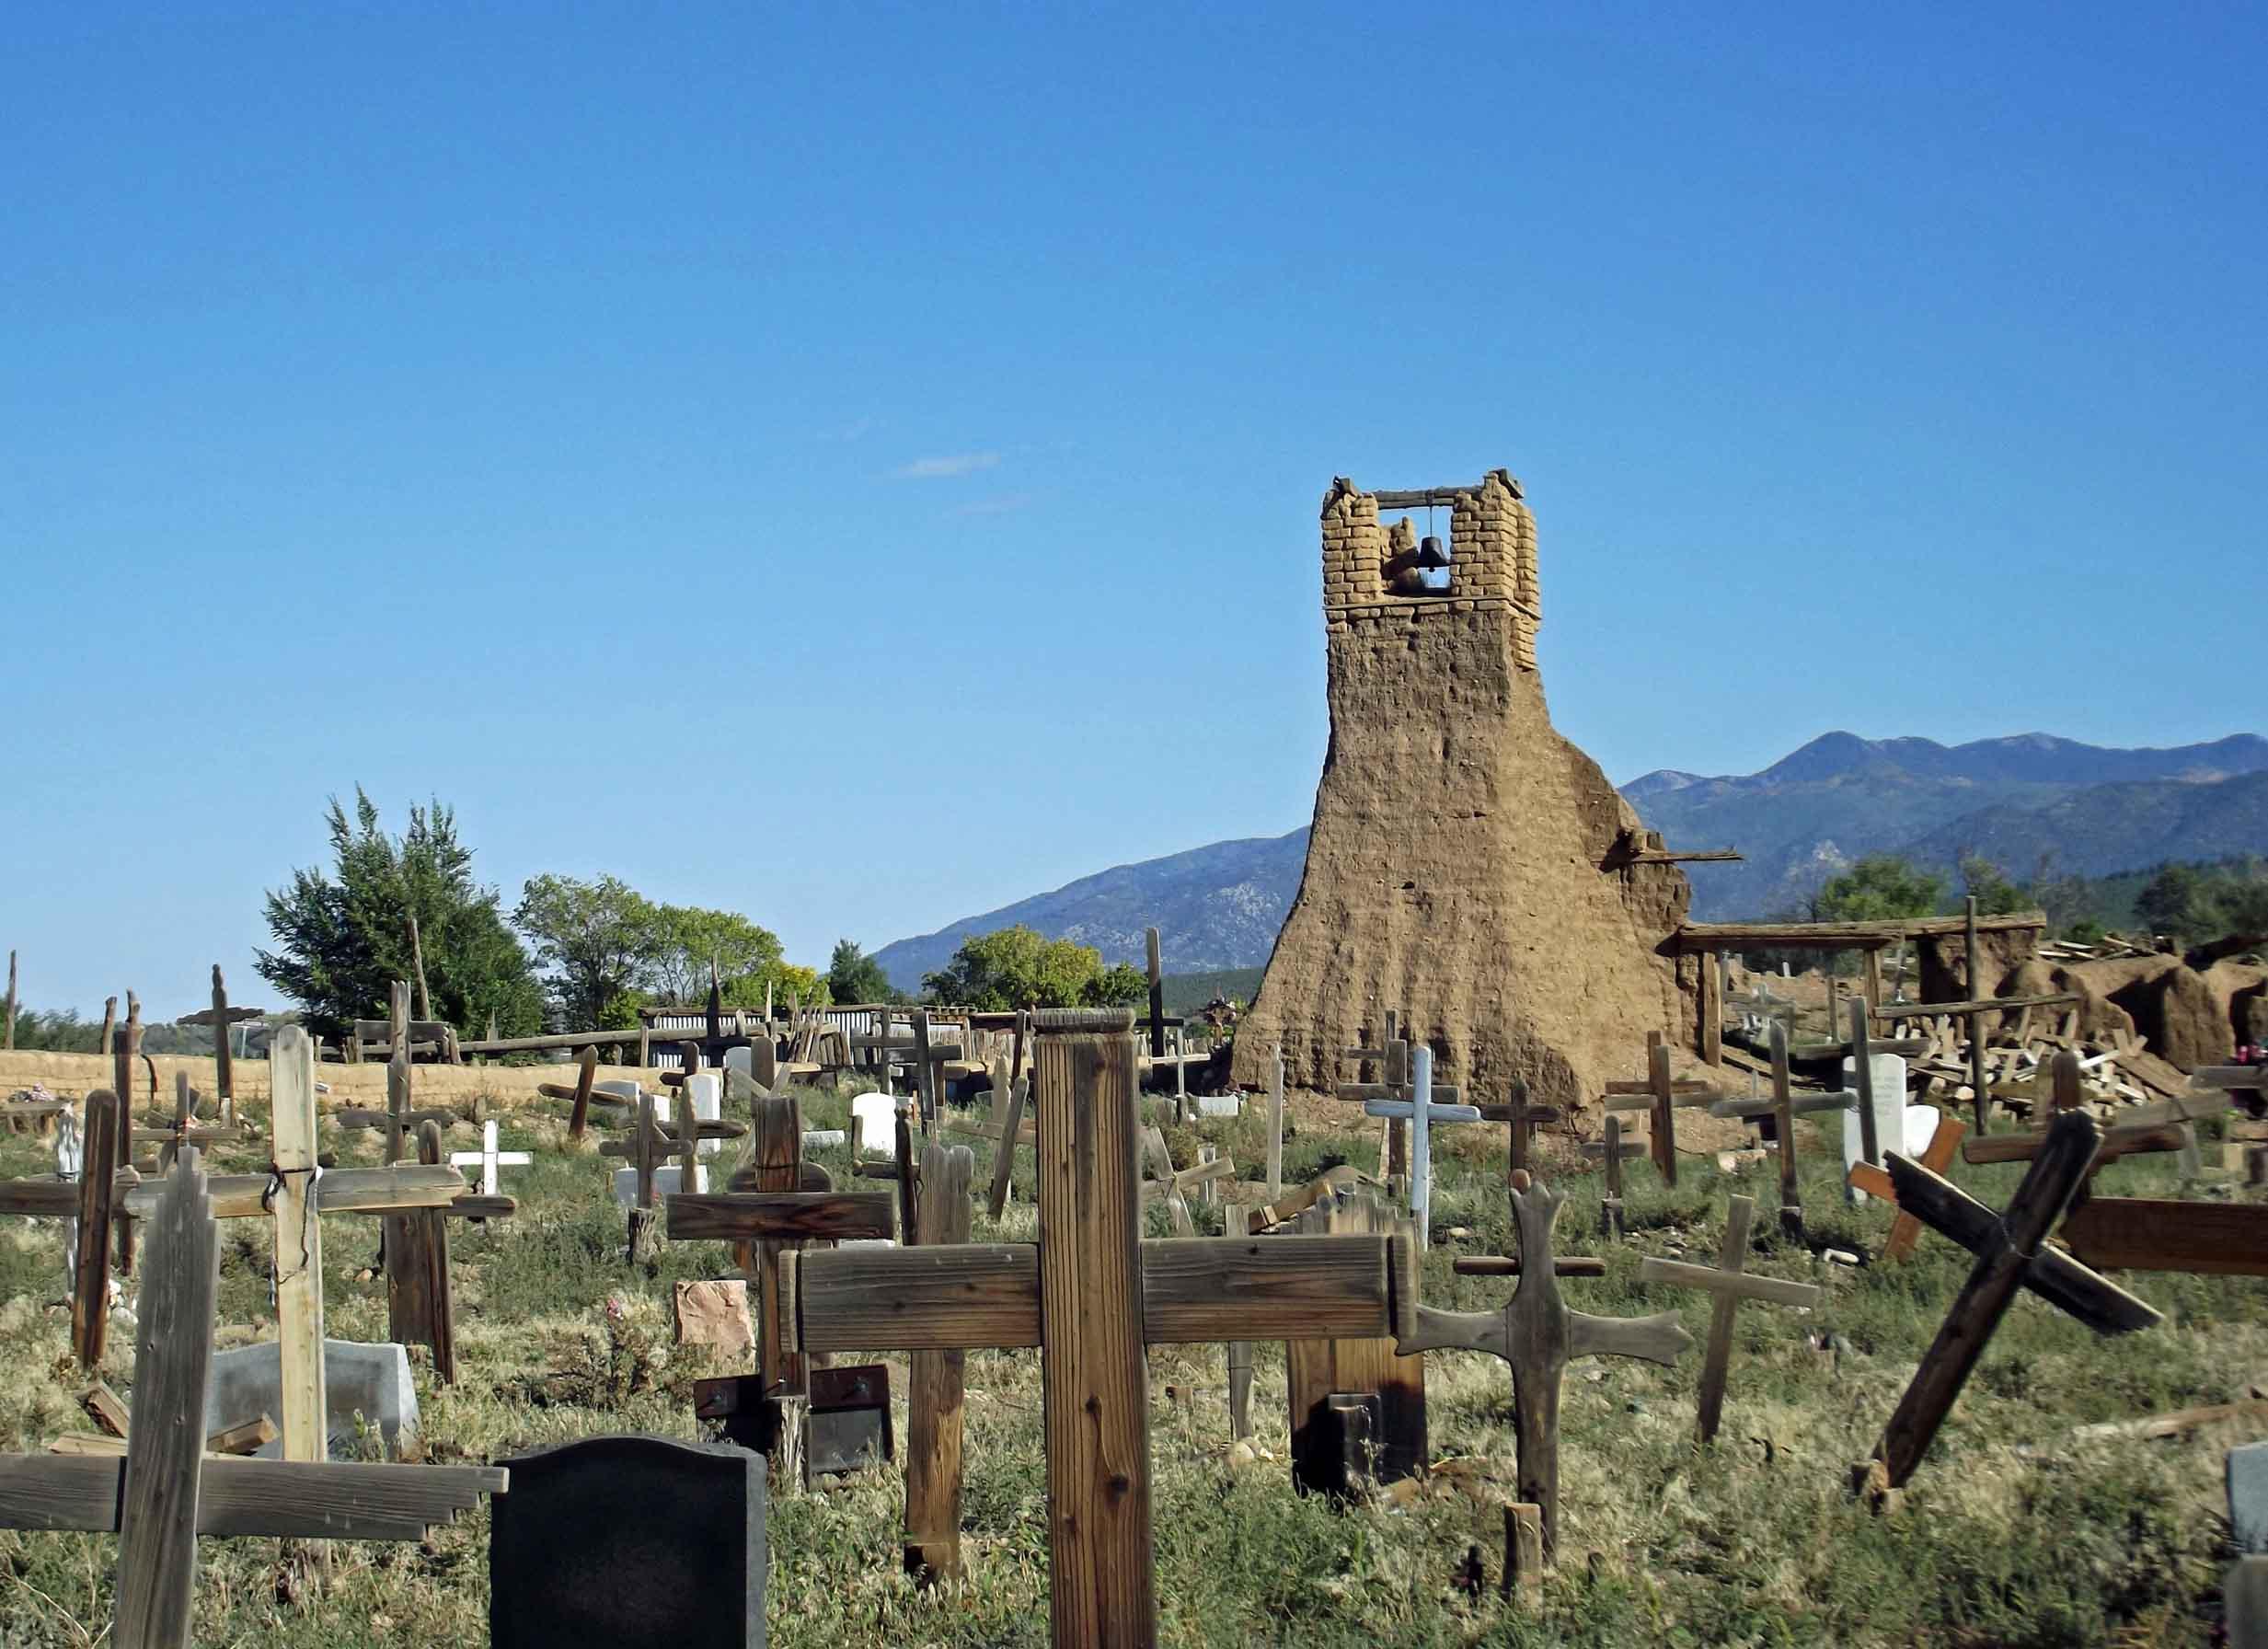 Ruined church set in a cemetery